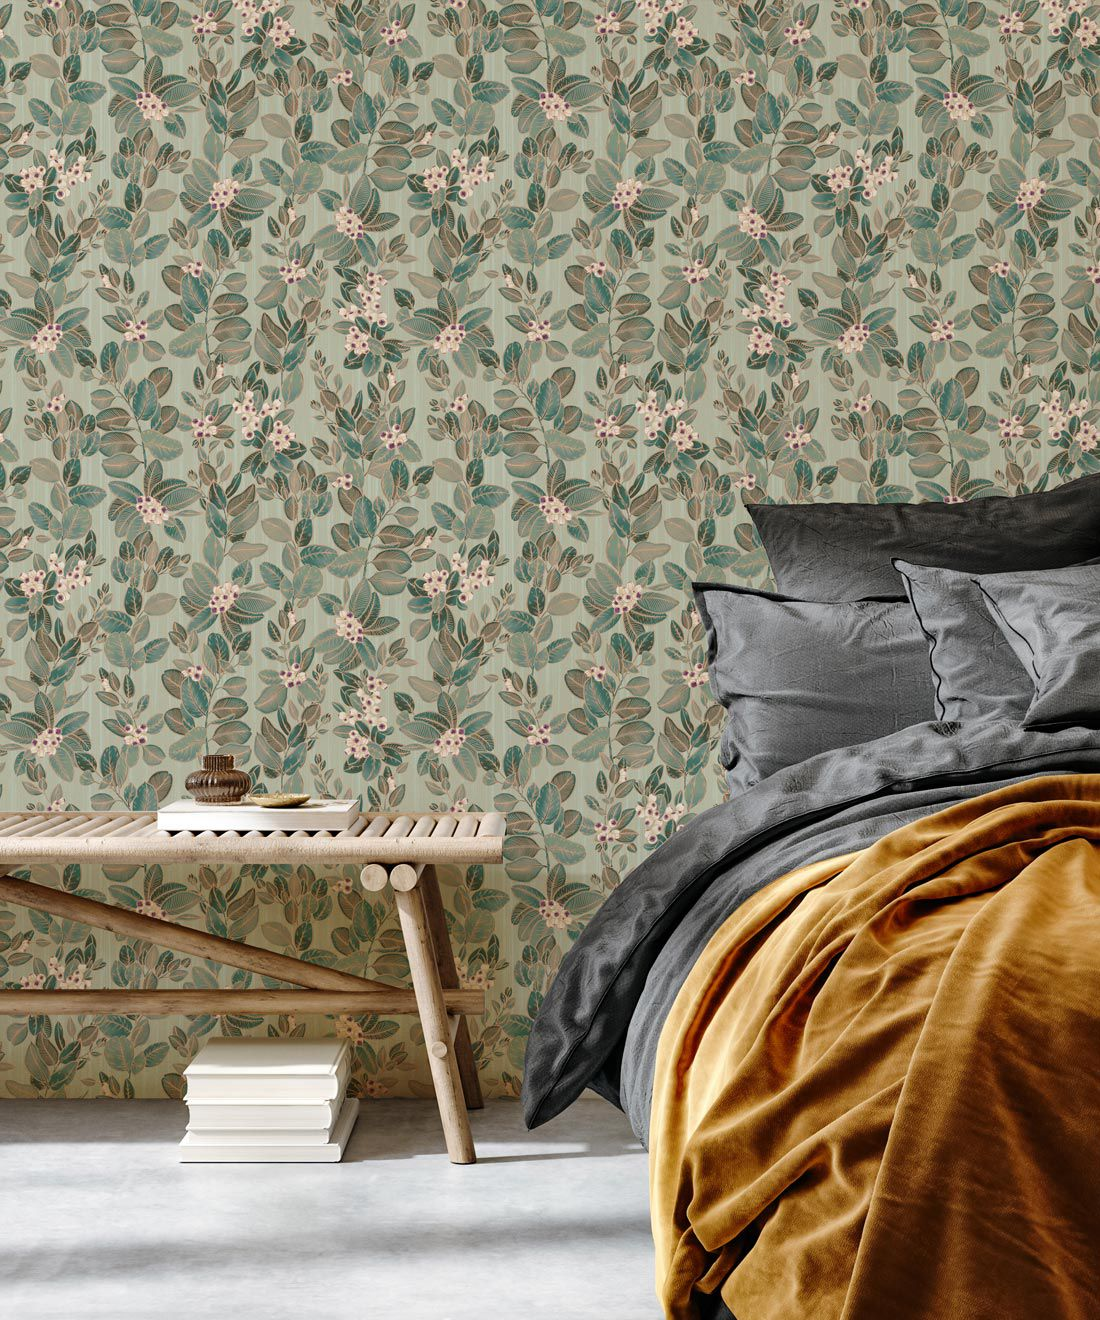 Eucalyptus Wallpaper • Eloise Short • Vintage Floral Wallpaper •Granny Chic Wallpaper • Grandmillennial Style Wallpaper •Pale Green •Insitu